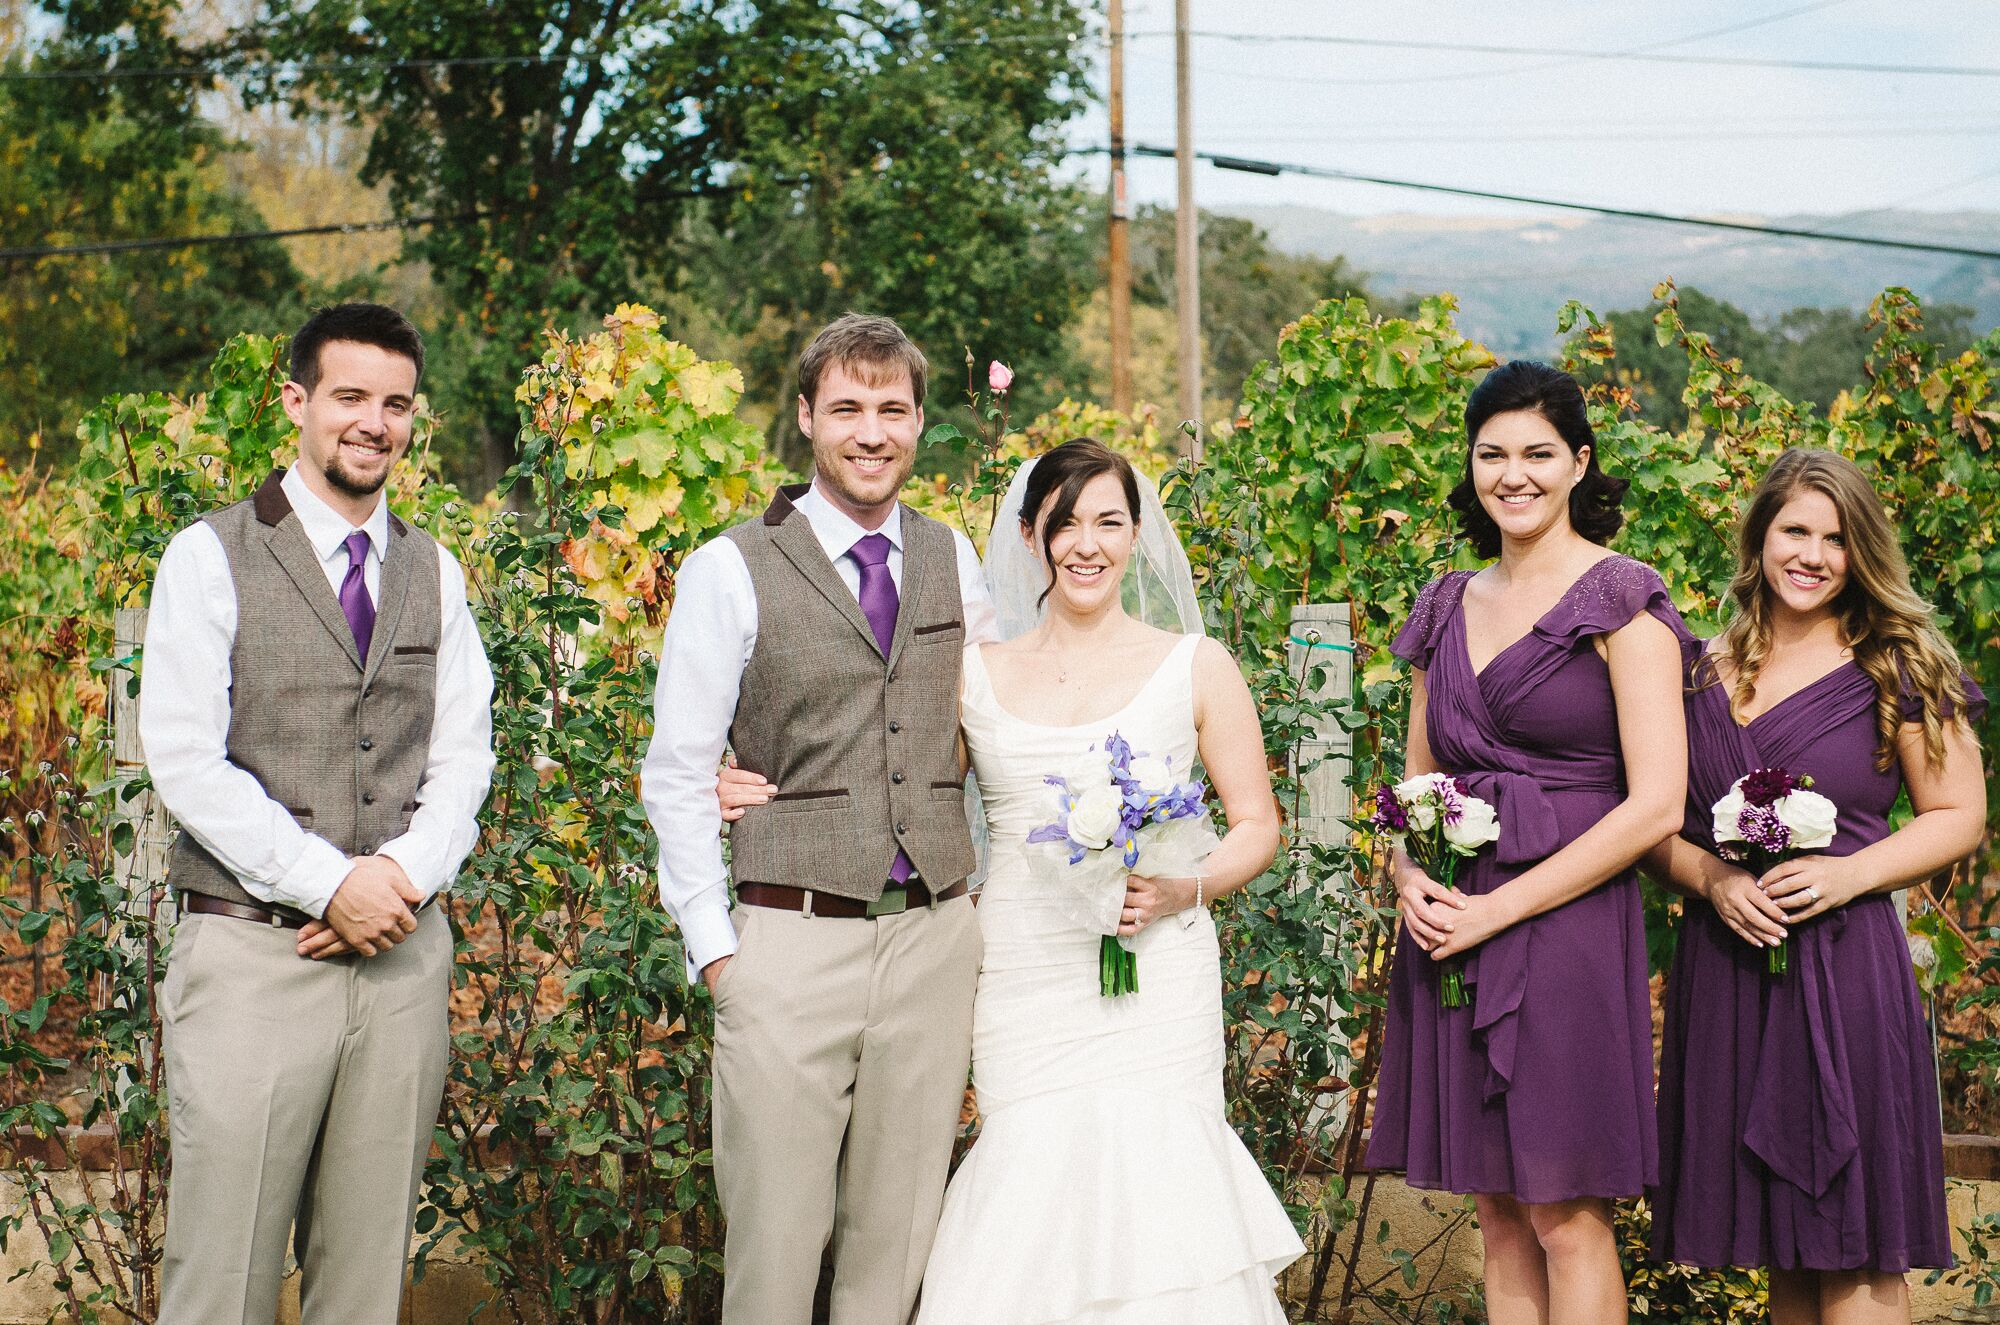 lilac bridesmaid and groom - HD2000×1325